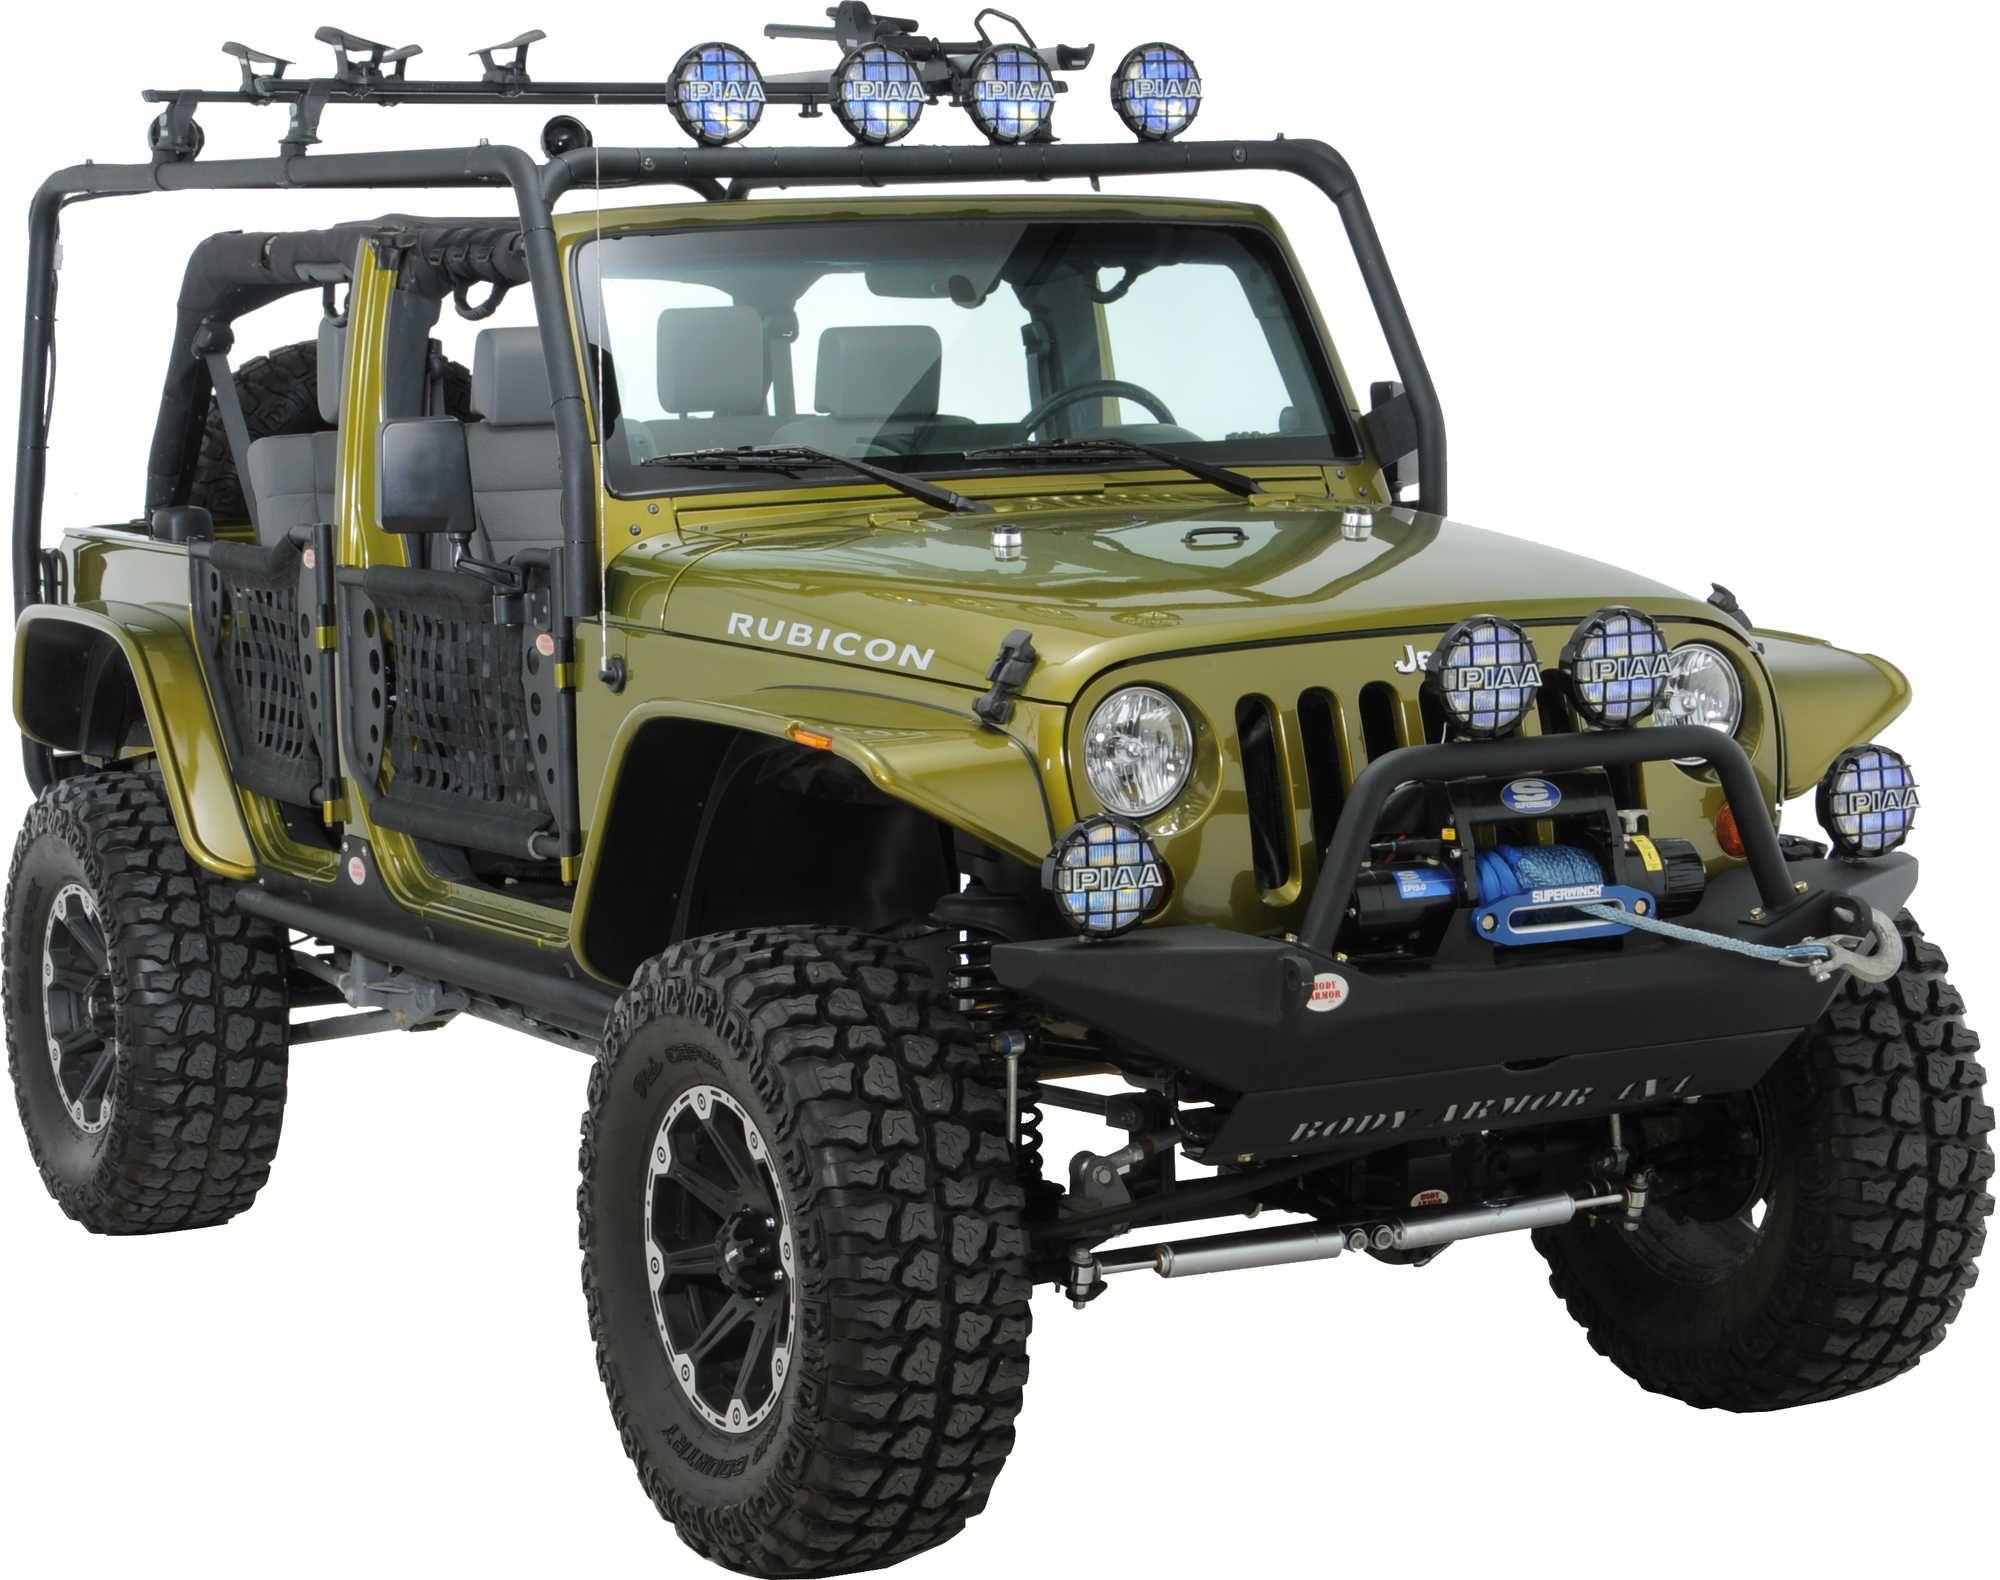 Body Armor 4x4 Roof Rack Base Kit For 07 16 Jeep Wrangler Jk 2 Door Quadratec